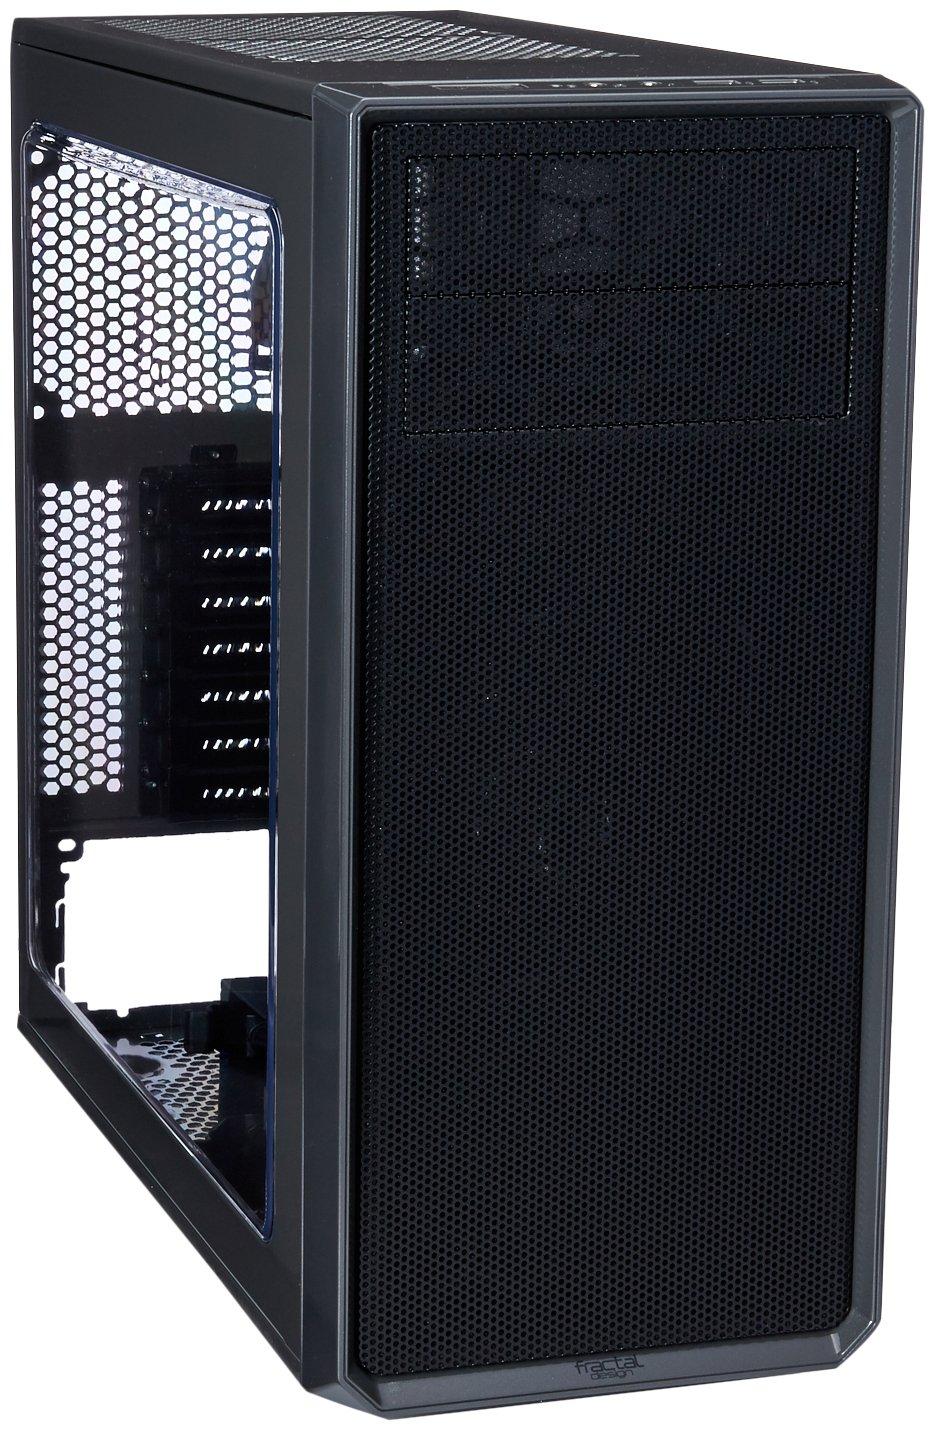 Fractal Design FD-CA-FOCUS-GY-W Focus G ATX Mid Tower Computer Case Gunmetal Gray